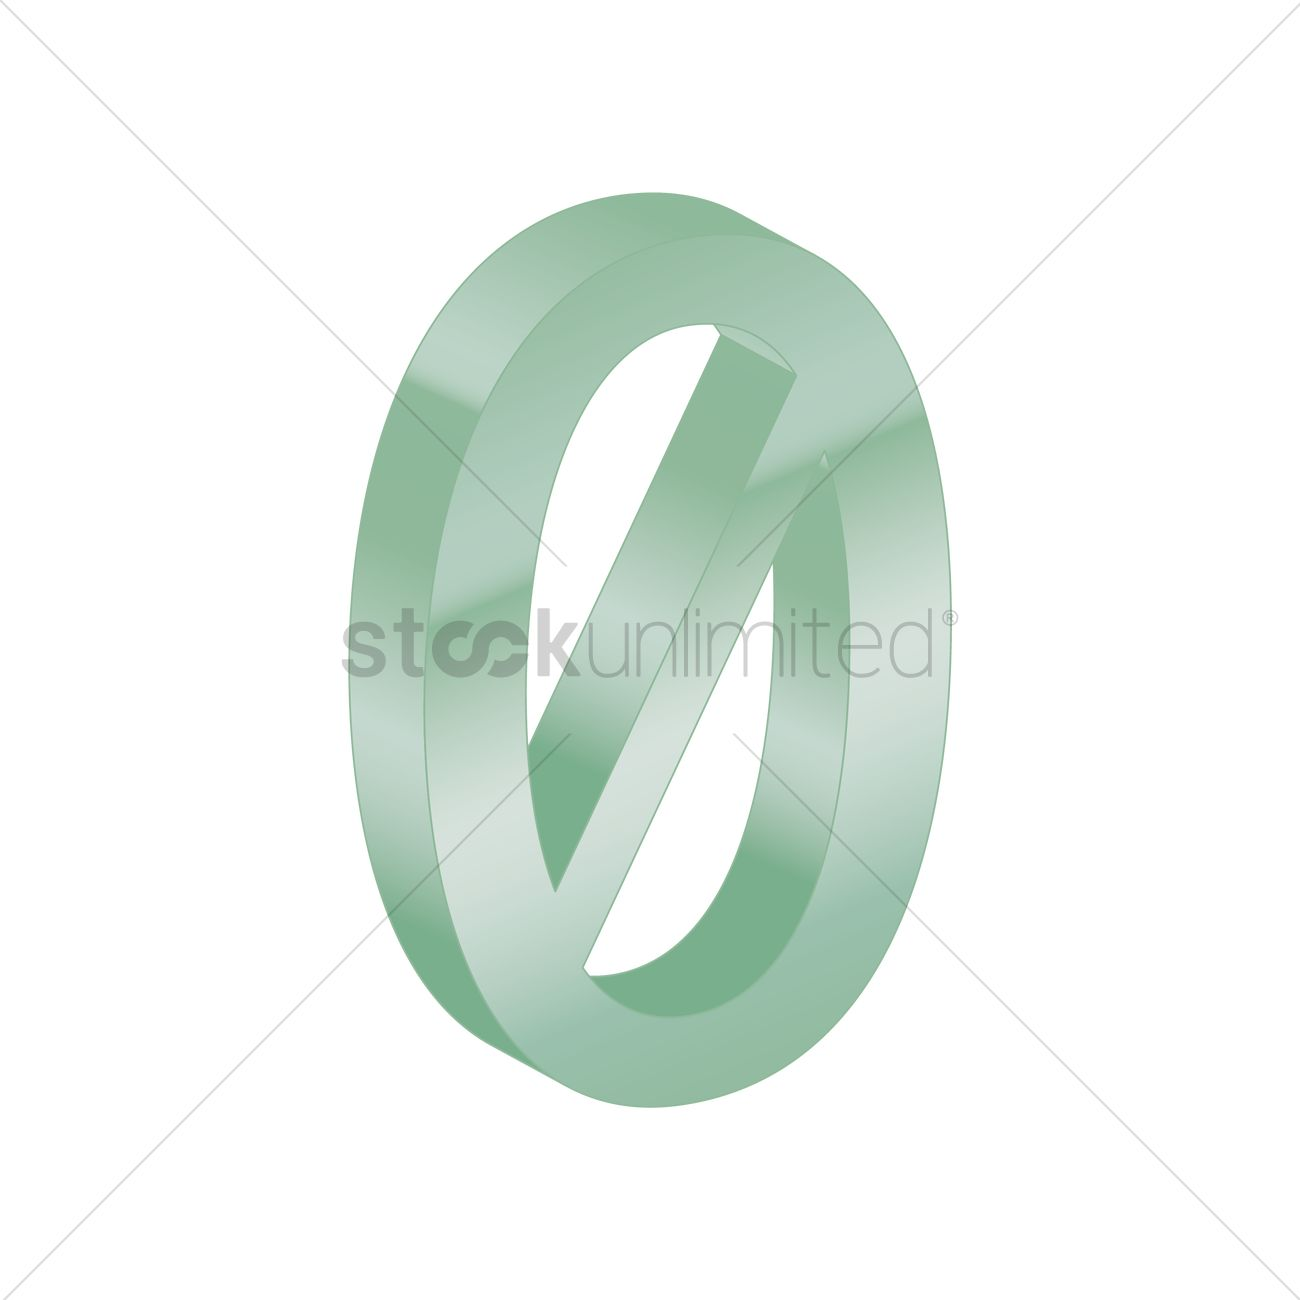 Theta symbol vector image 1866666 stockunlimited theta symbol vector graphic biocorpaavc Image collections